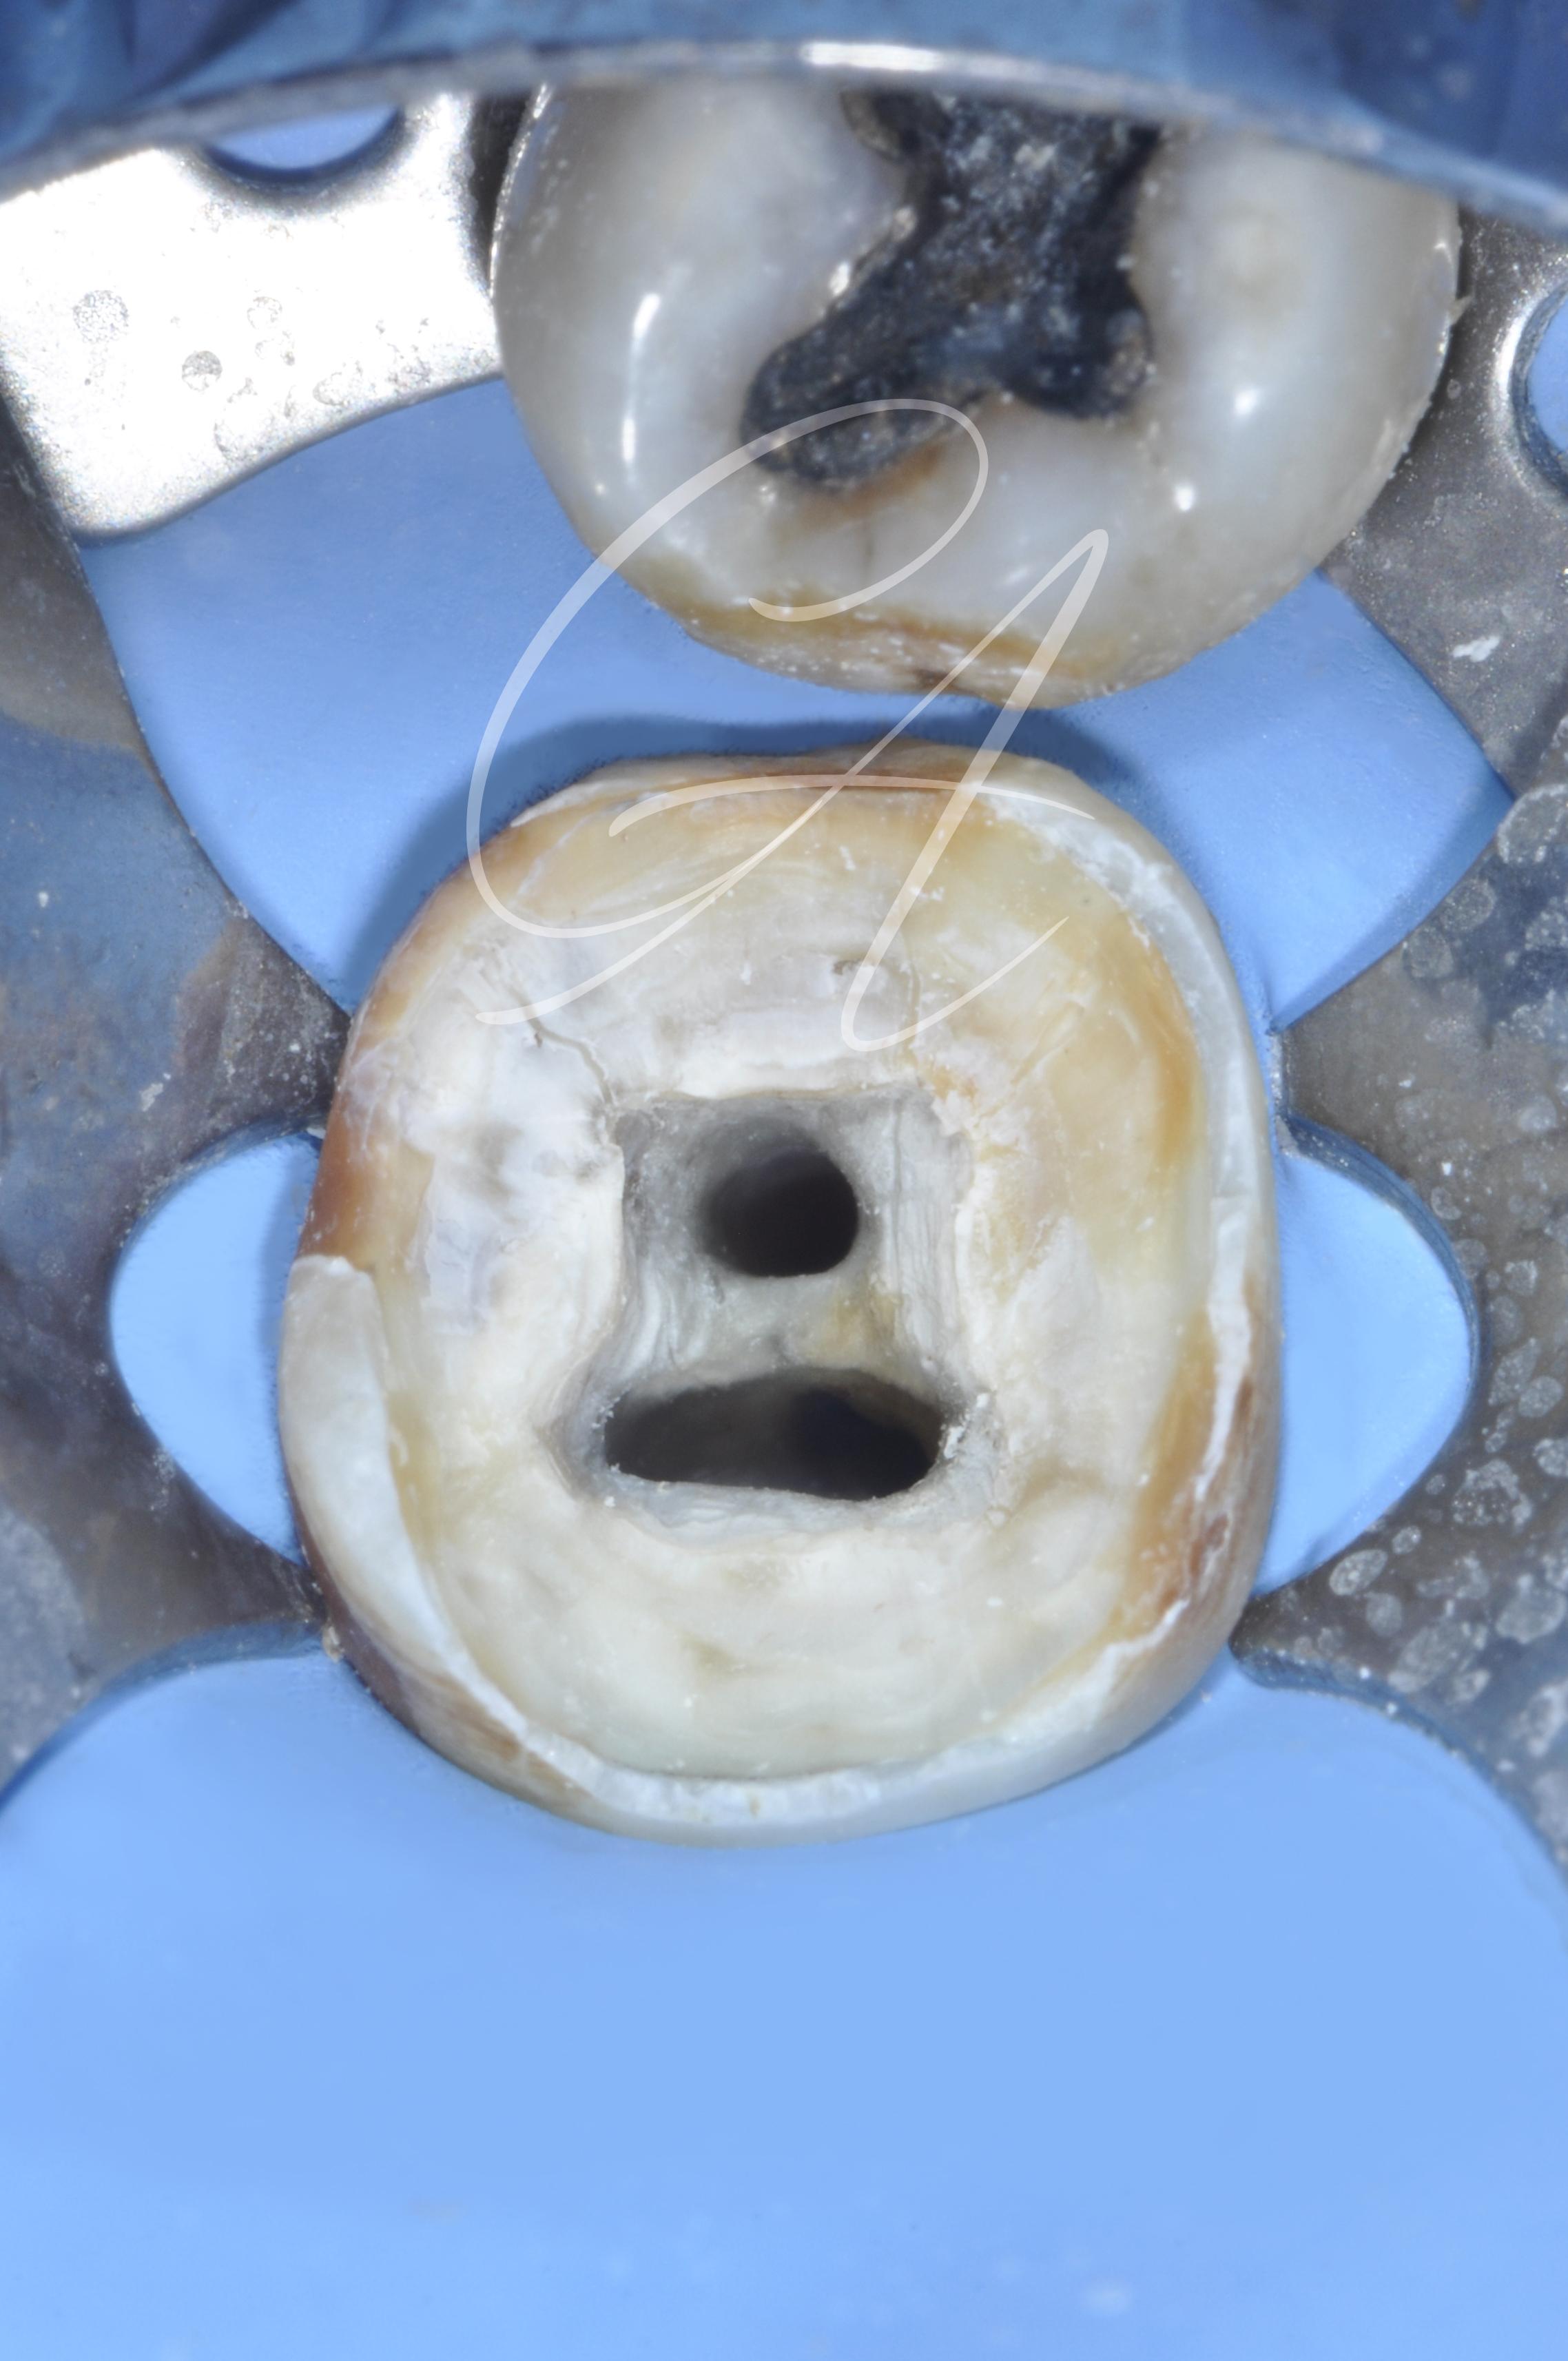 Fase intraoperatoria